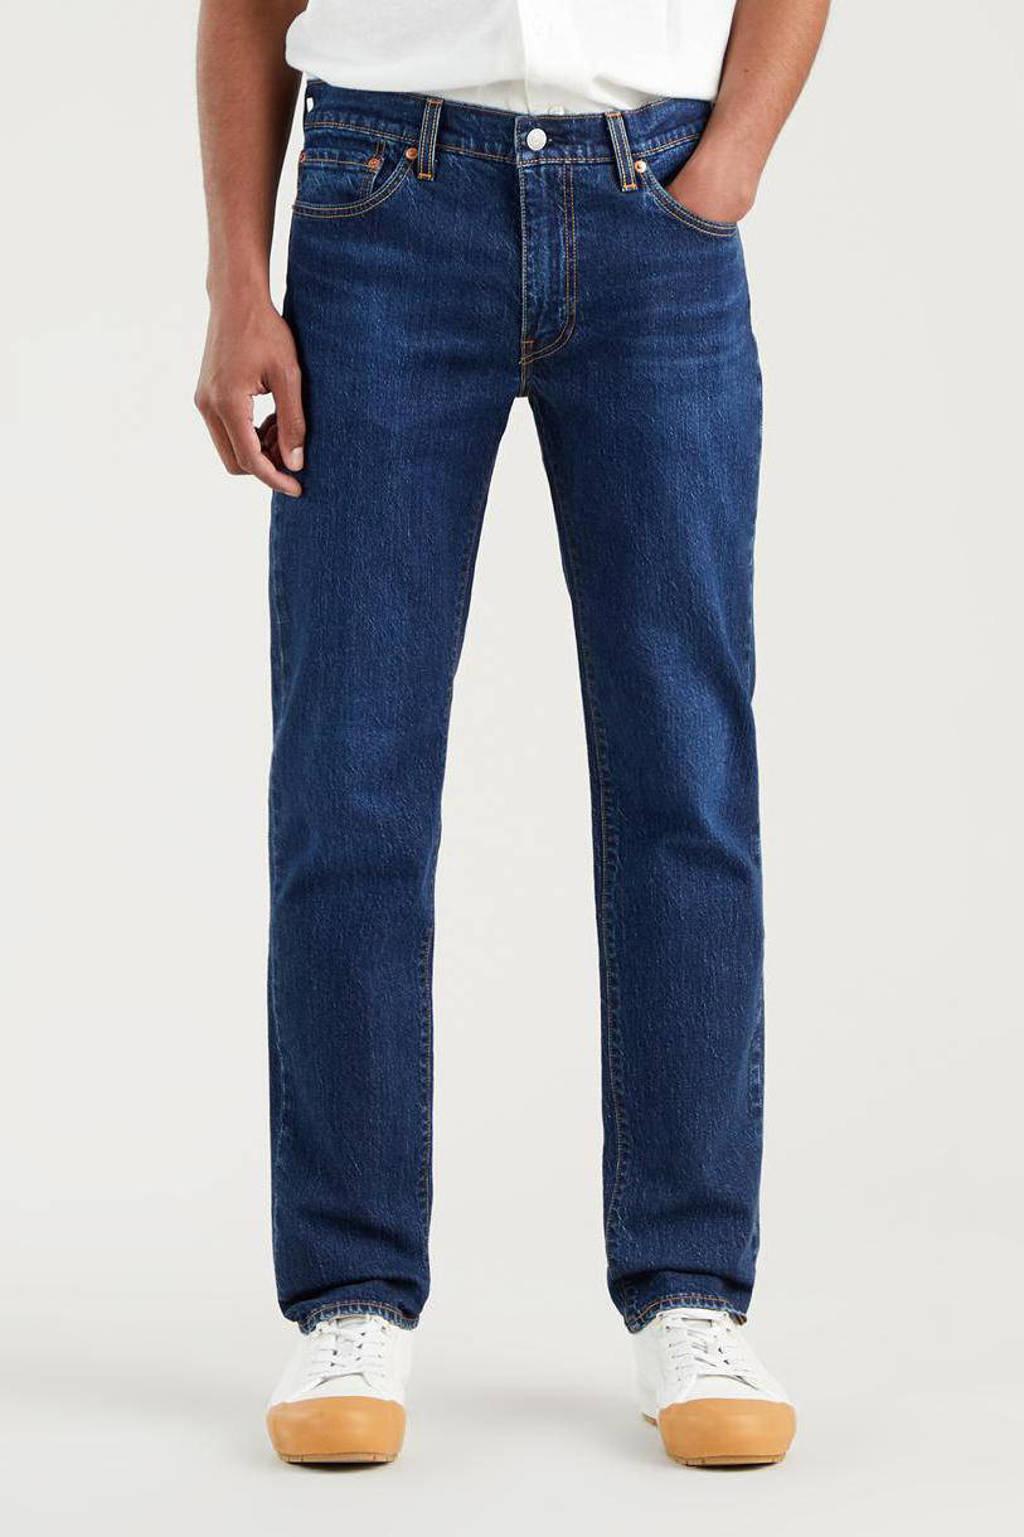 Levi's 511 slim fit jeans laurelhurst just worn, LAURELHURST JUST WORN